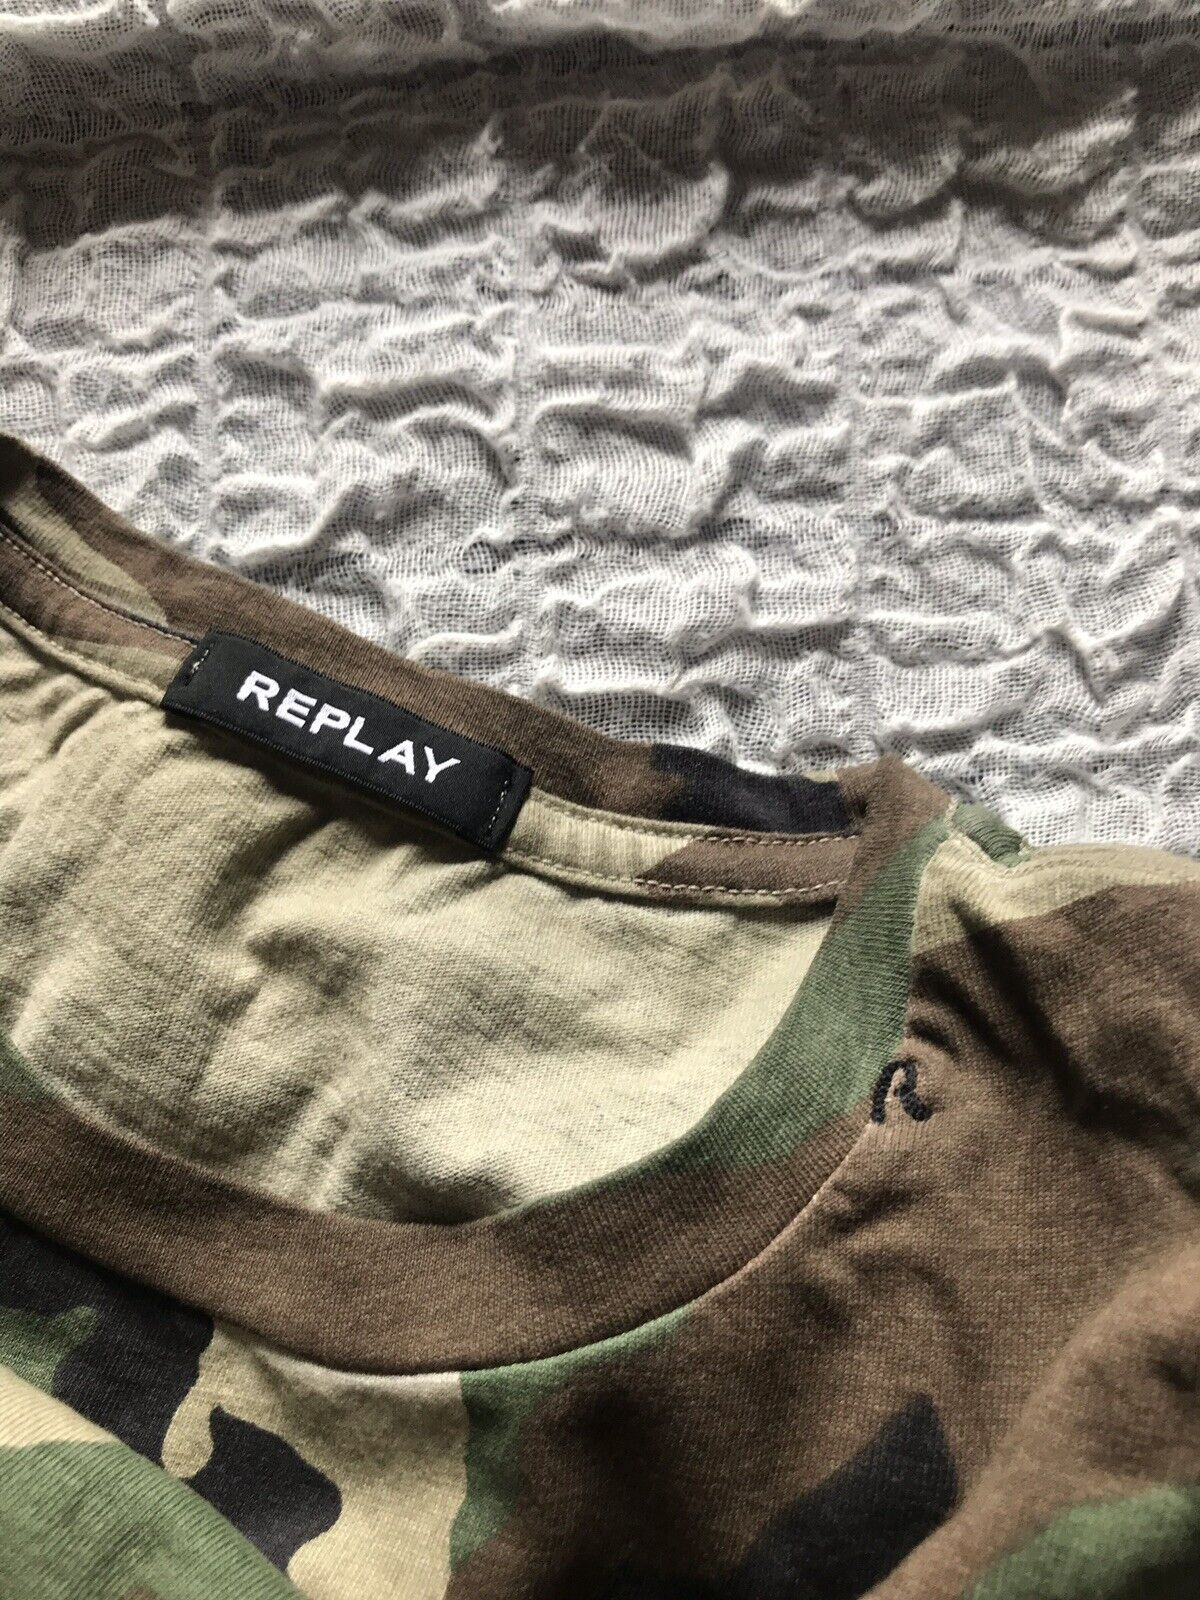 T Shirt Replay mod.Militare Grün Mimetico Größe XL Con Patch Sulle Maniche